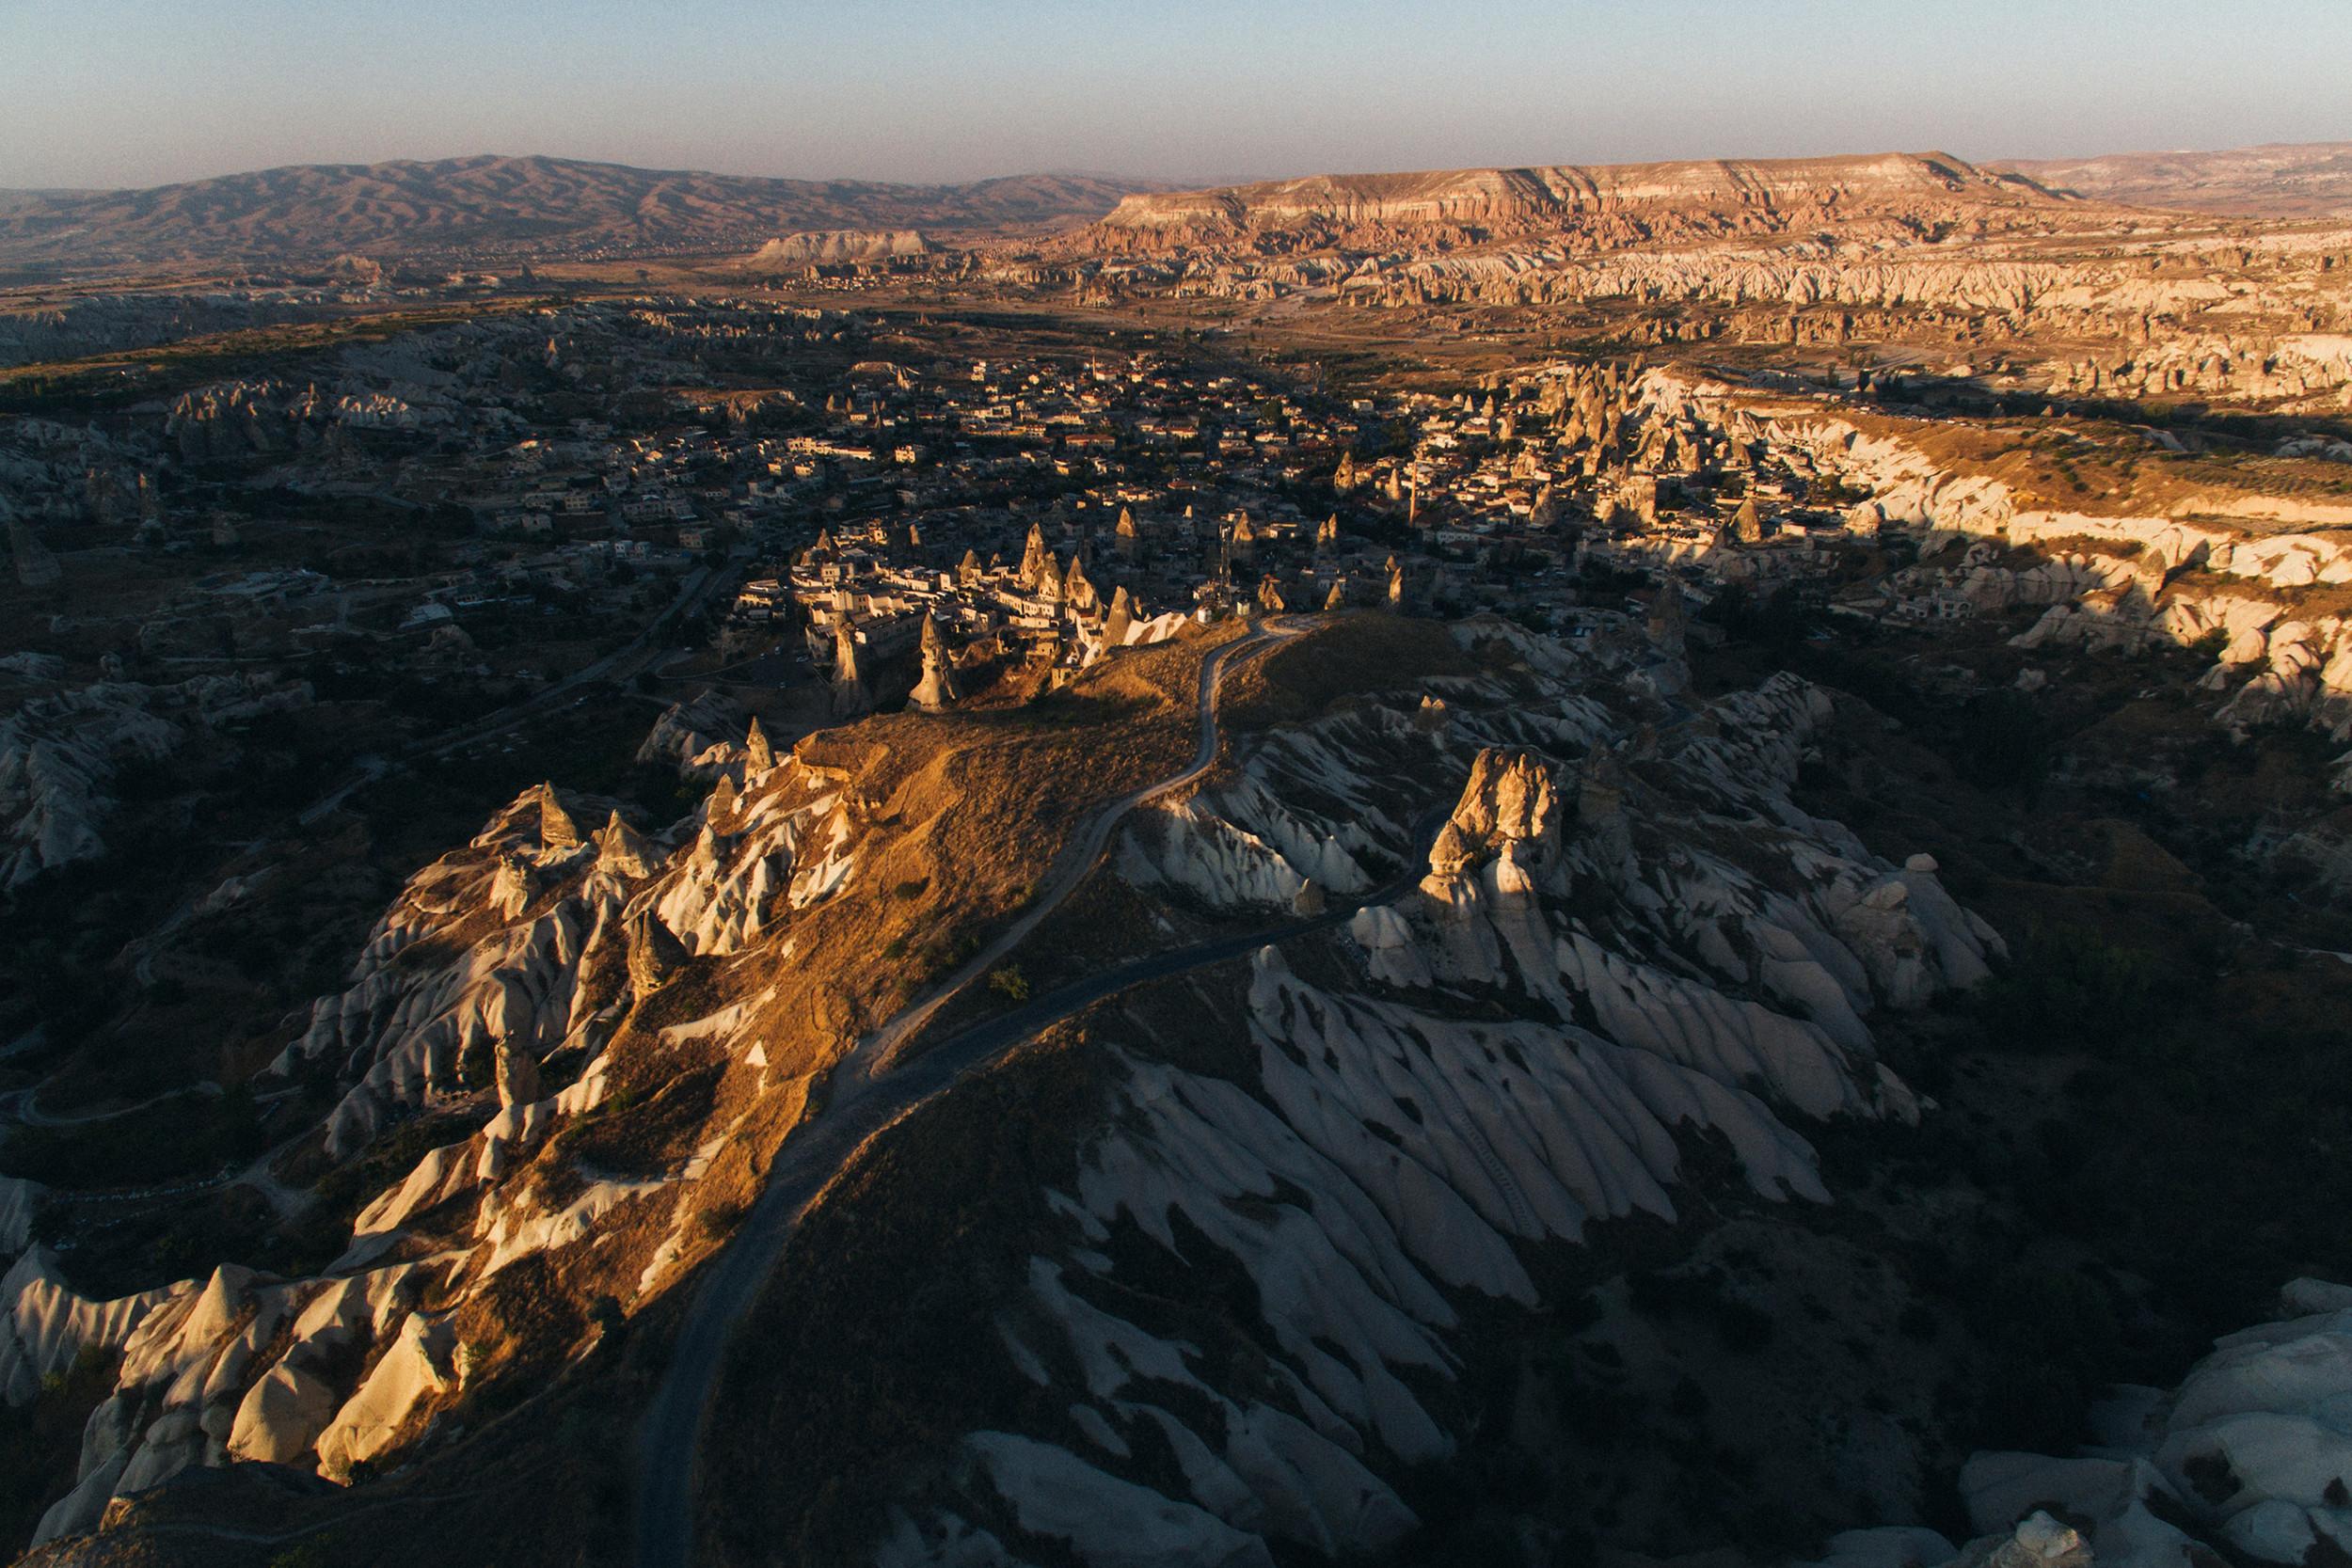 Landscape from far above, Cappadocia